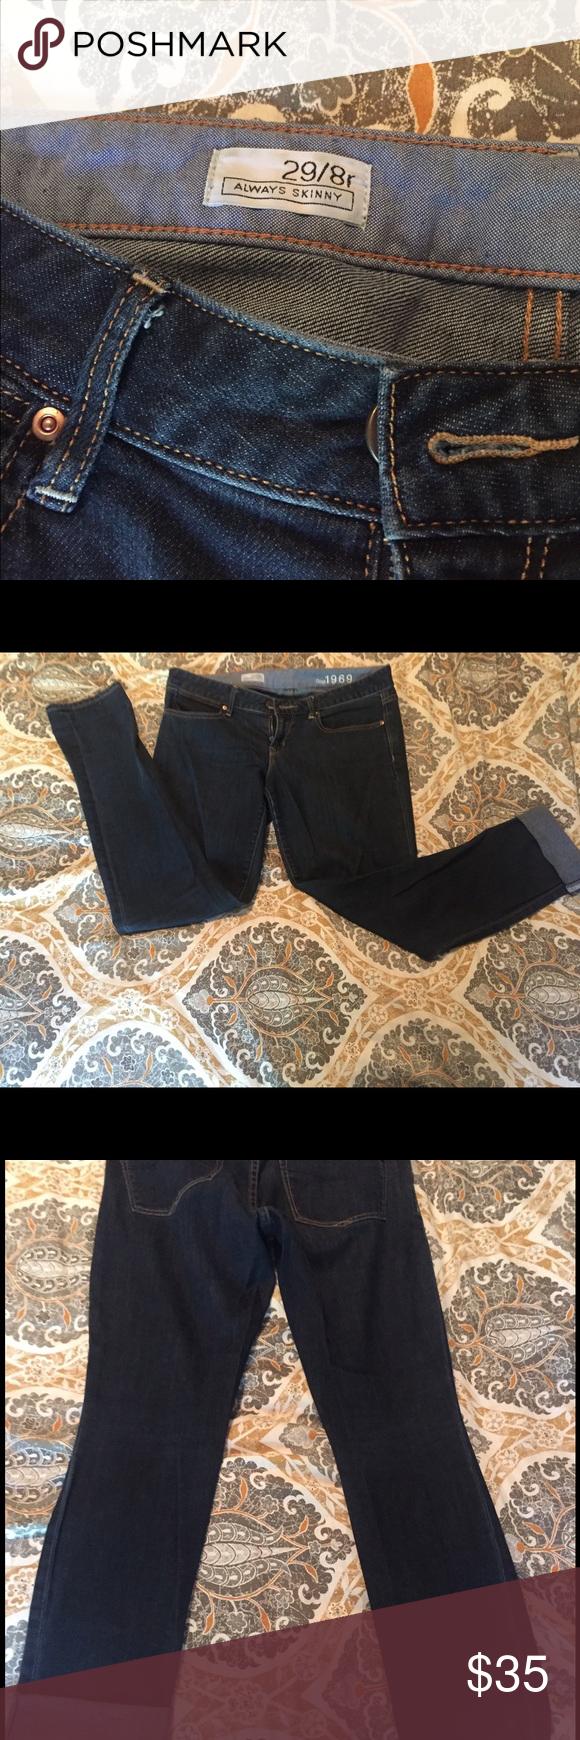 Gap Always Skinny Jeans Great, comfortable, clean skinny cut jeans. No rips tears or holes. GAP Jeans Skinny